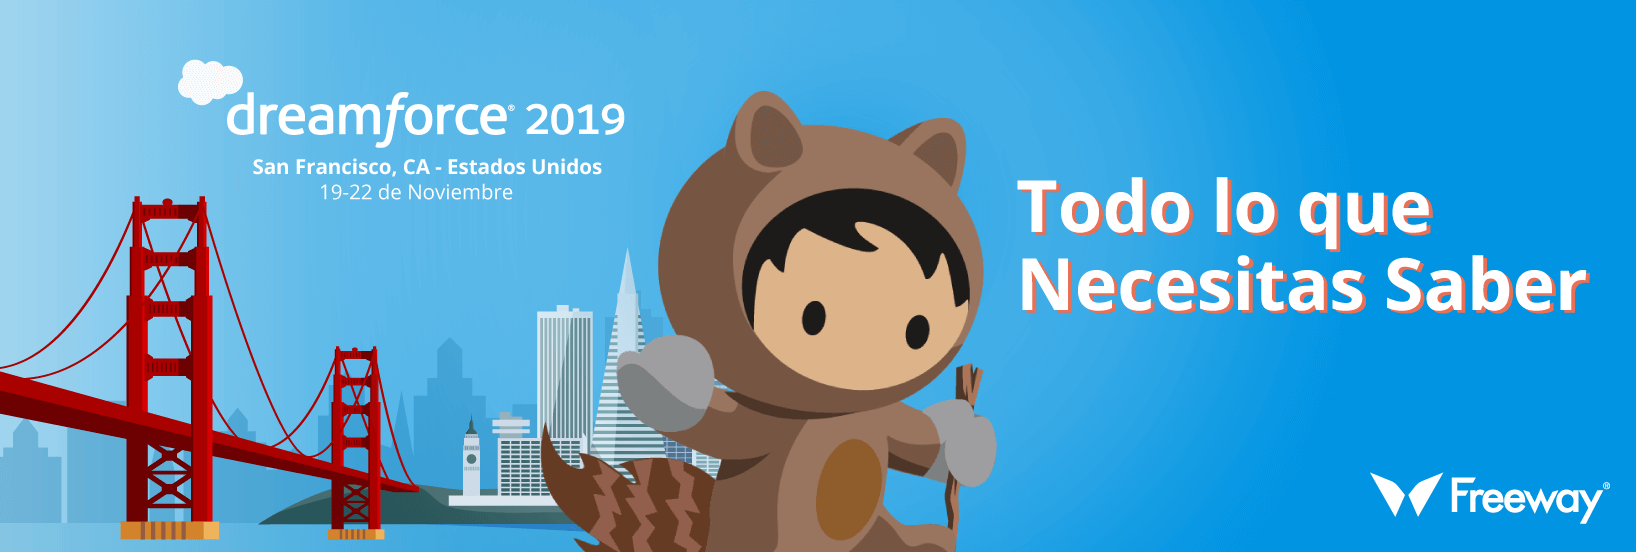 Salesforce-Dreamforce-2019-todo-saber